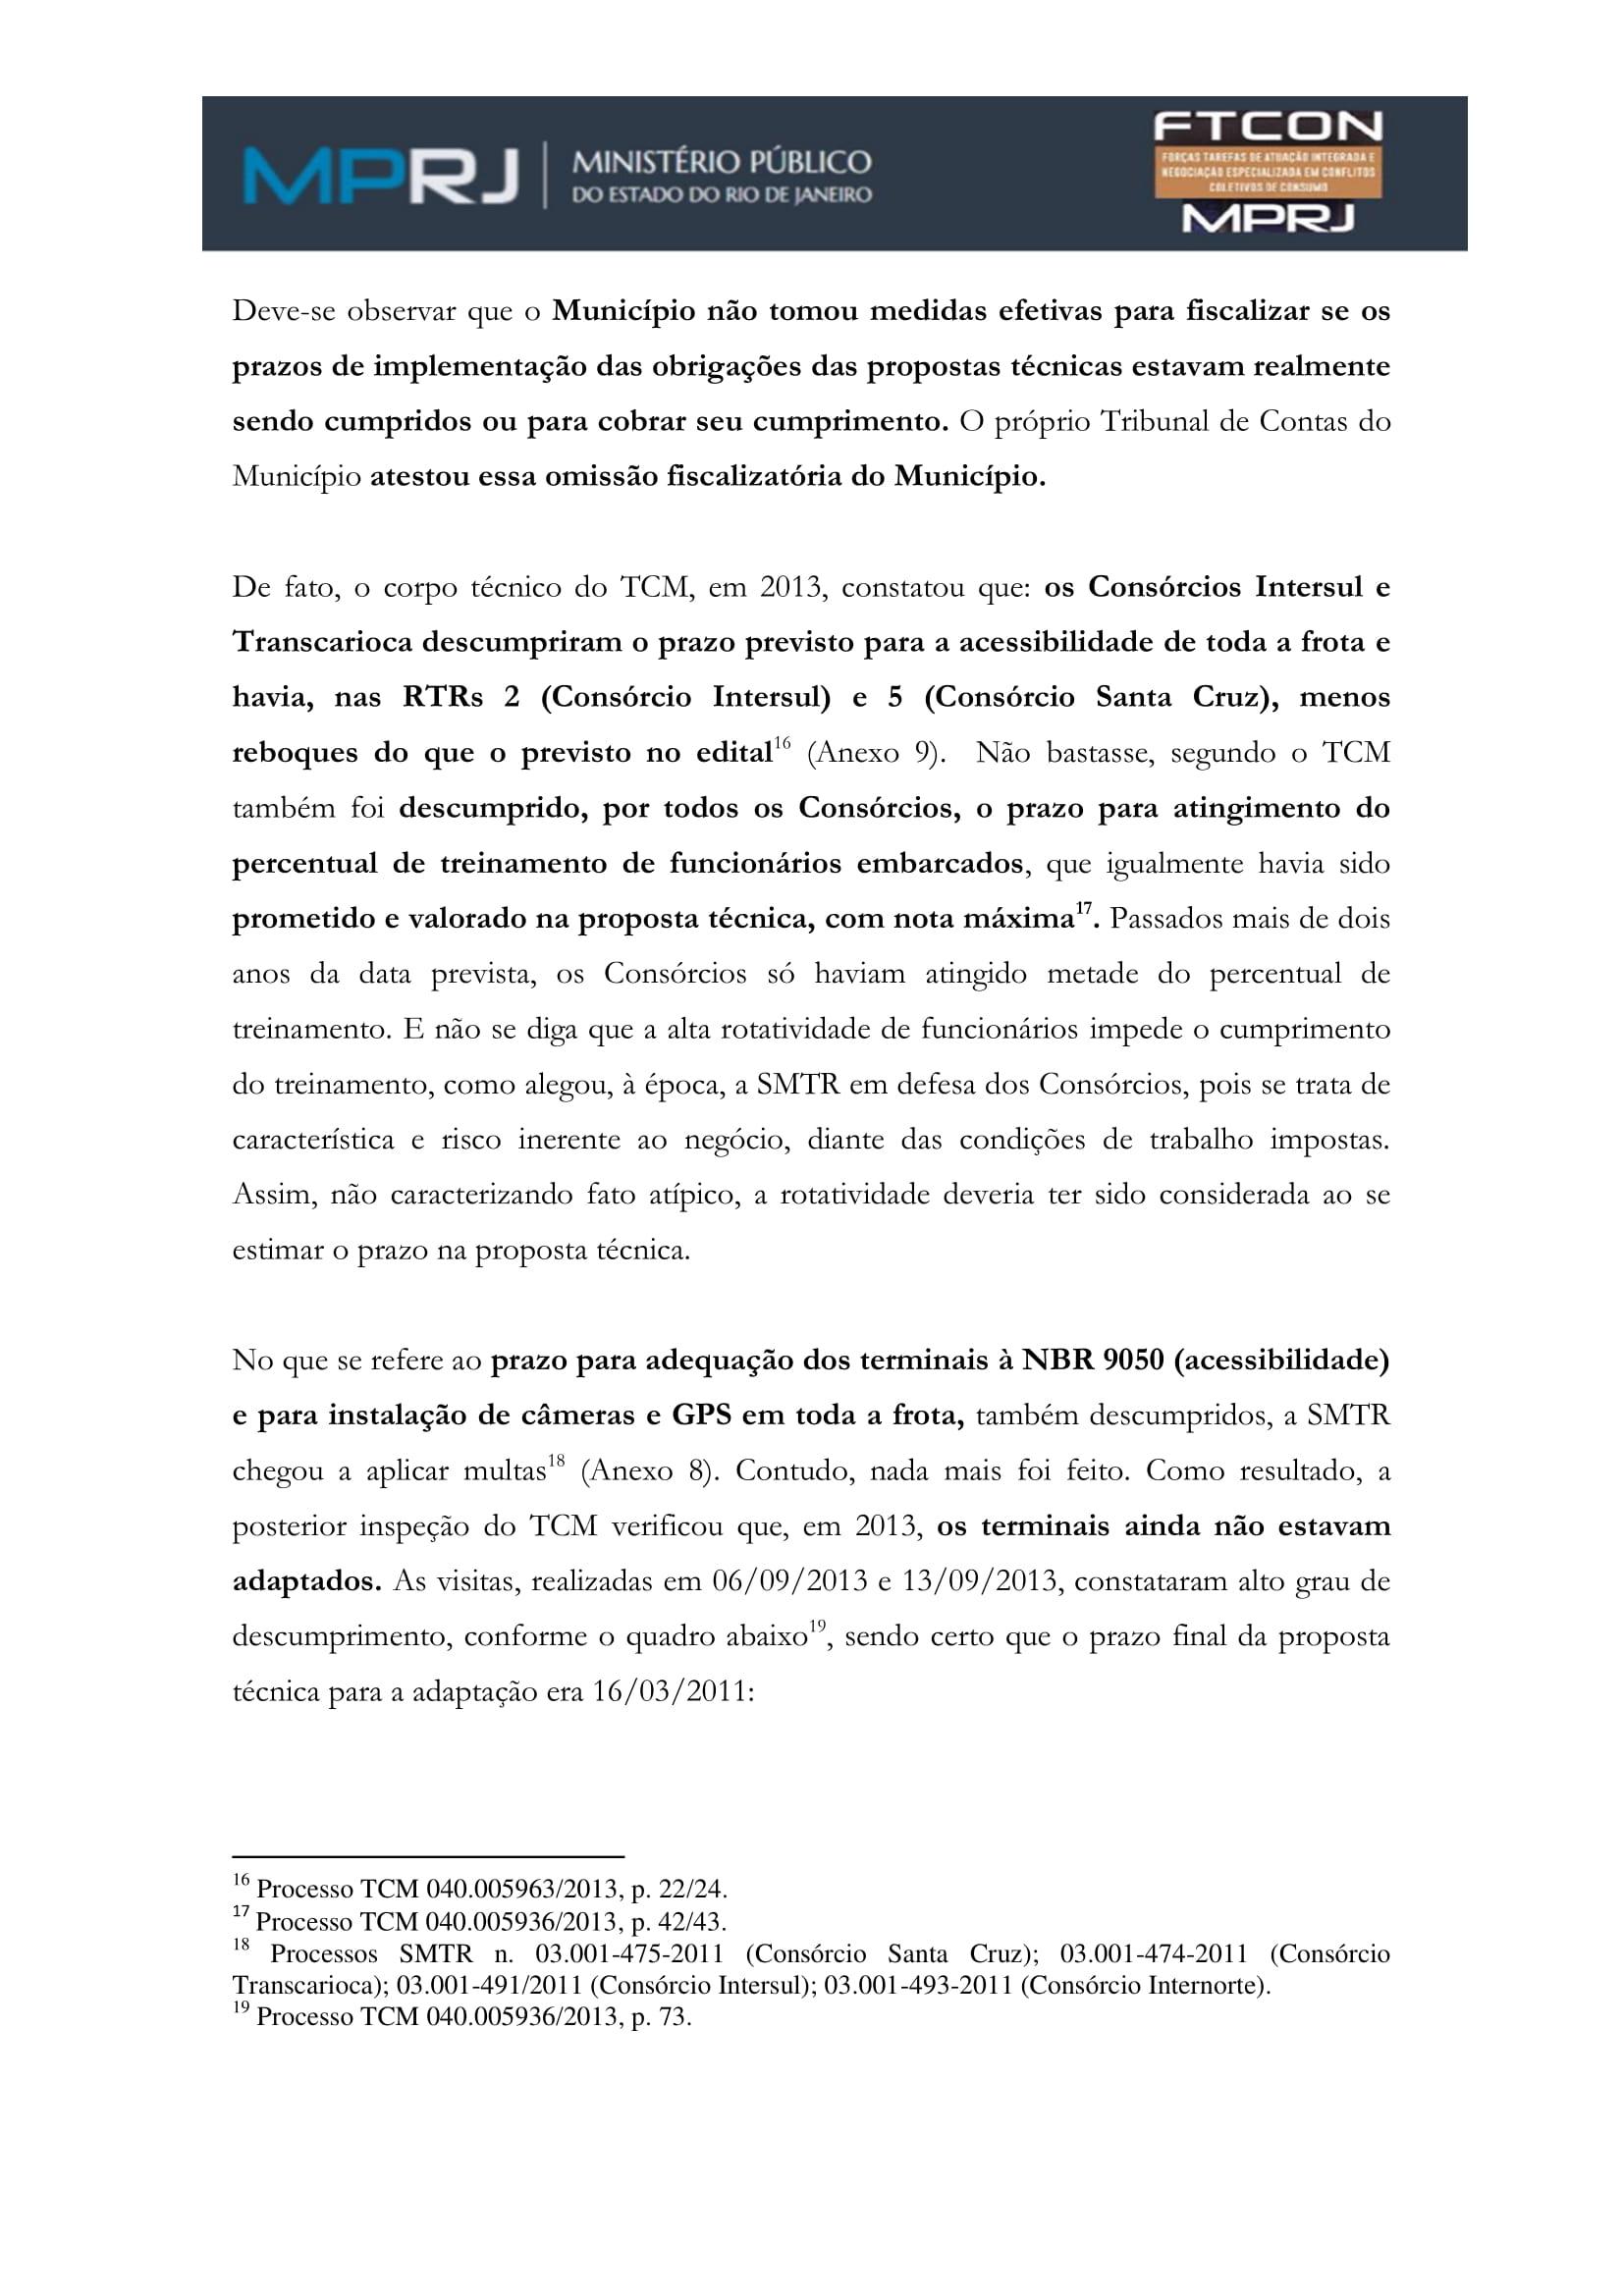 acp_caducidade_onibus_dr_rt-019